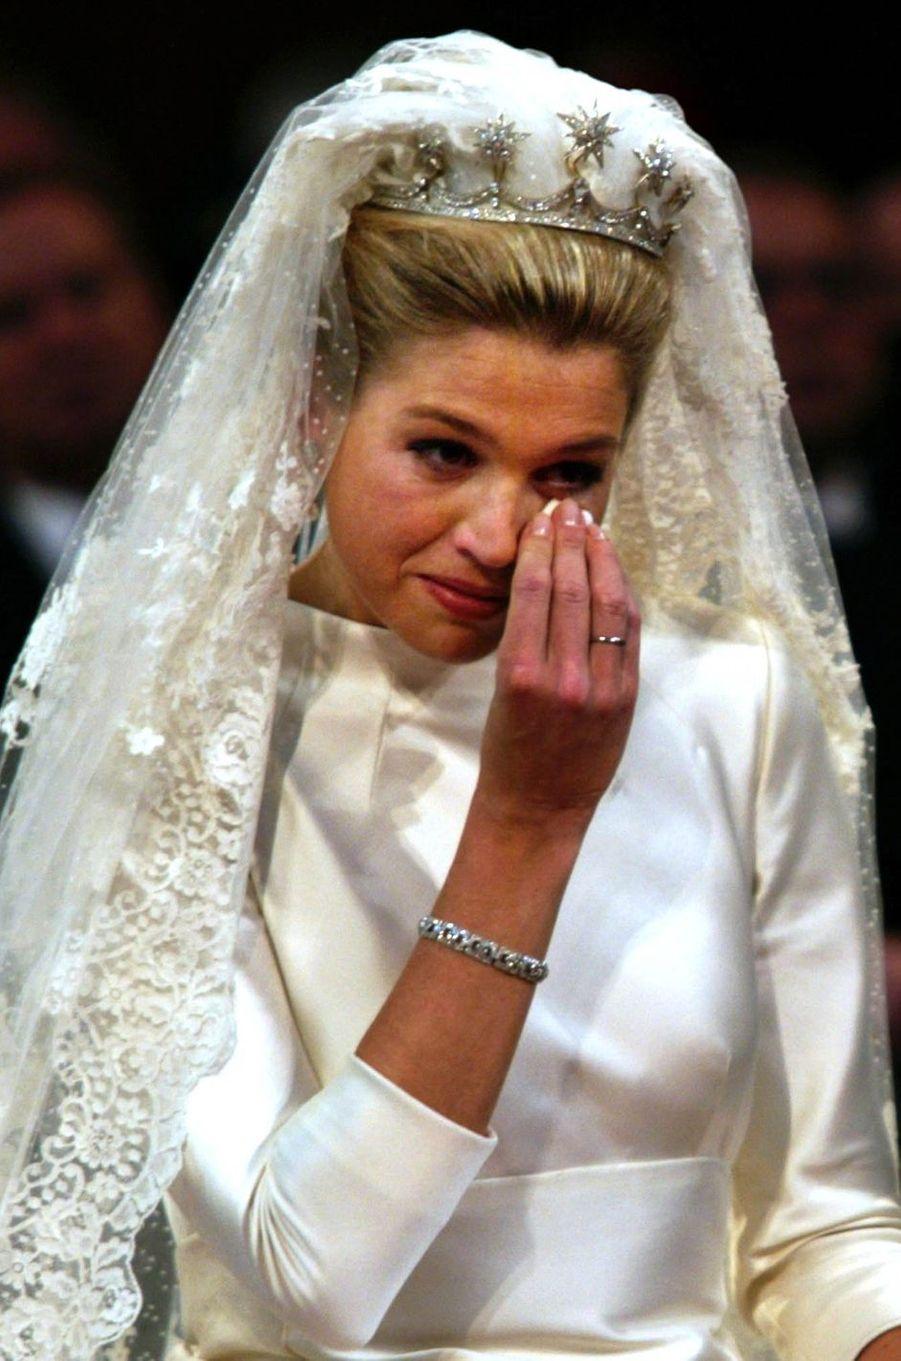 Maxima Zorreguieta à Amsterdam, le 2 février 2002